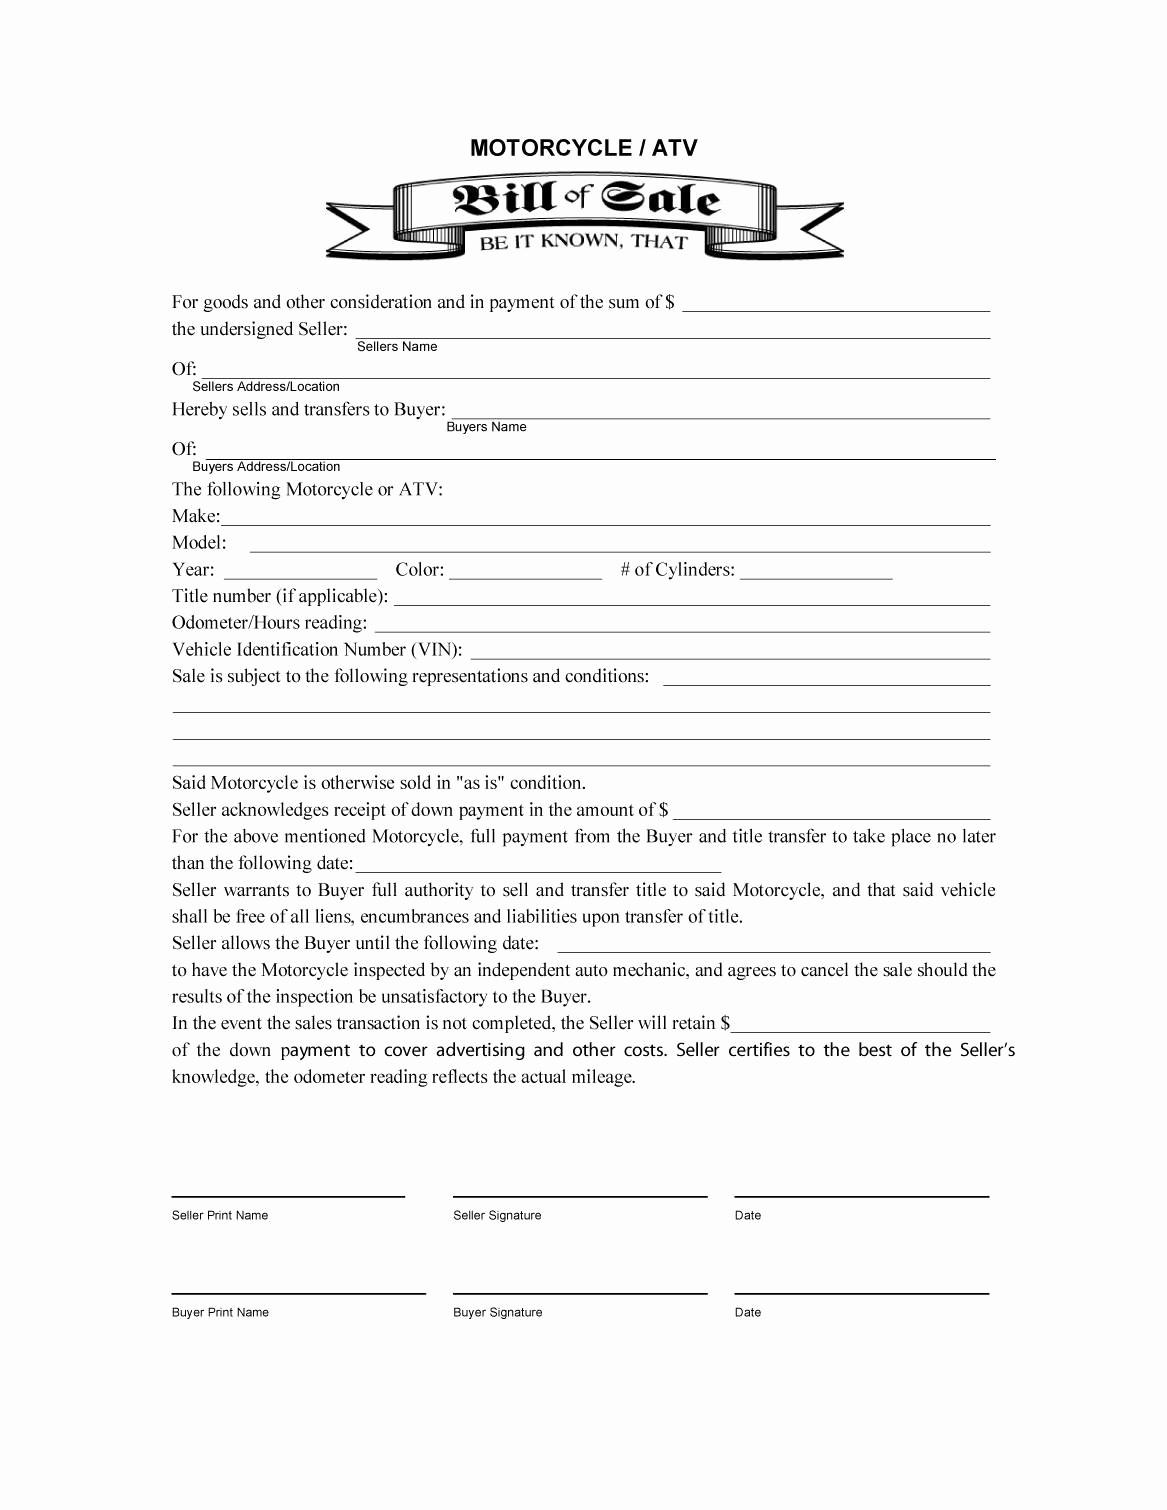 Free Template Bill Of Sale New 45 Fee Printable Bill Of Sale Templates Car Boat Gun